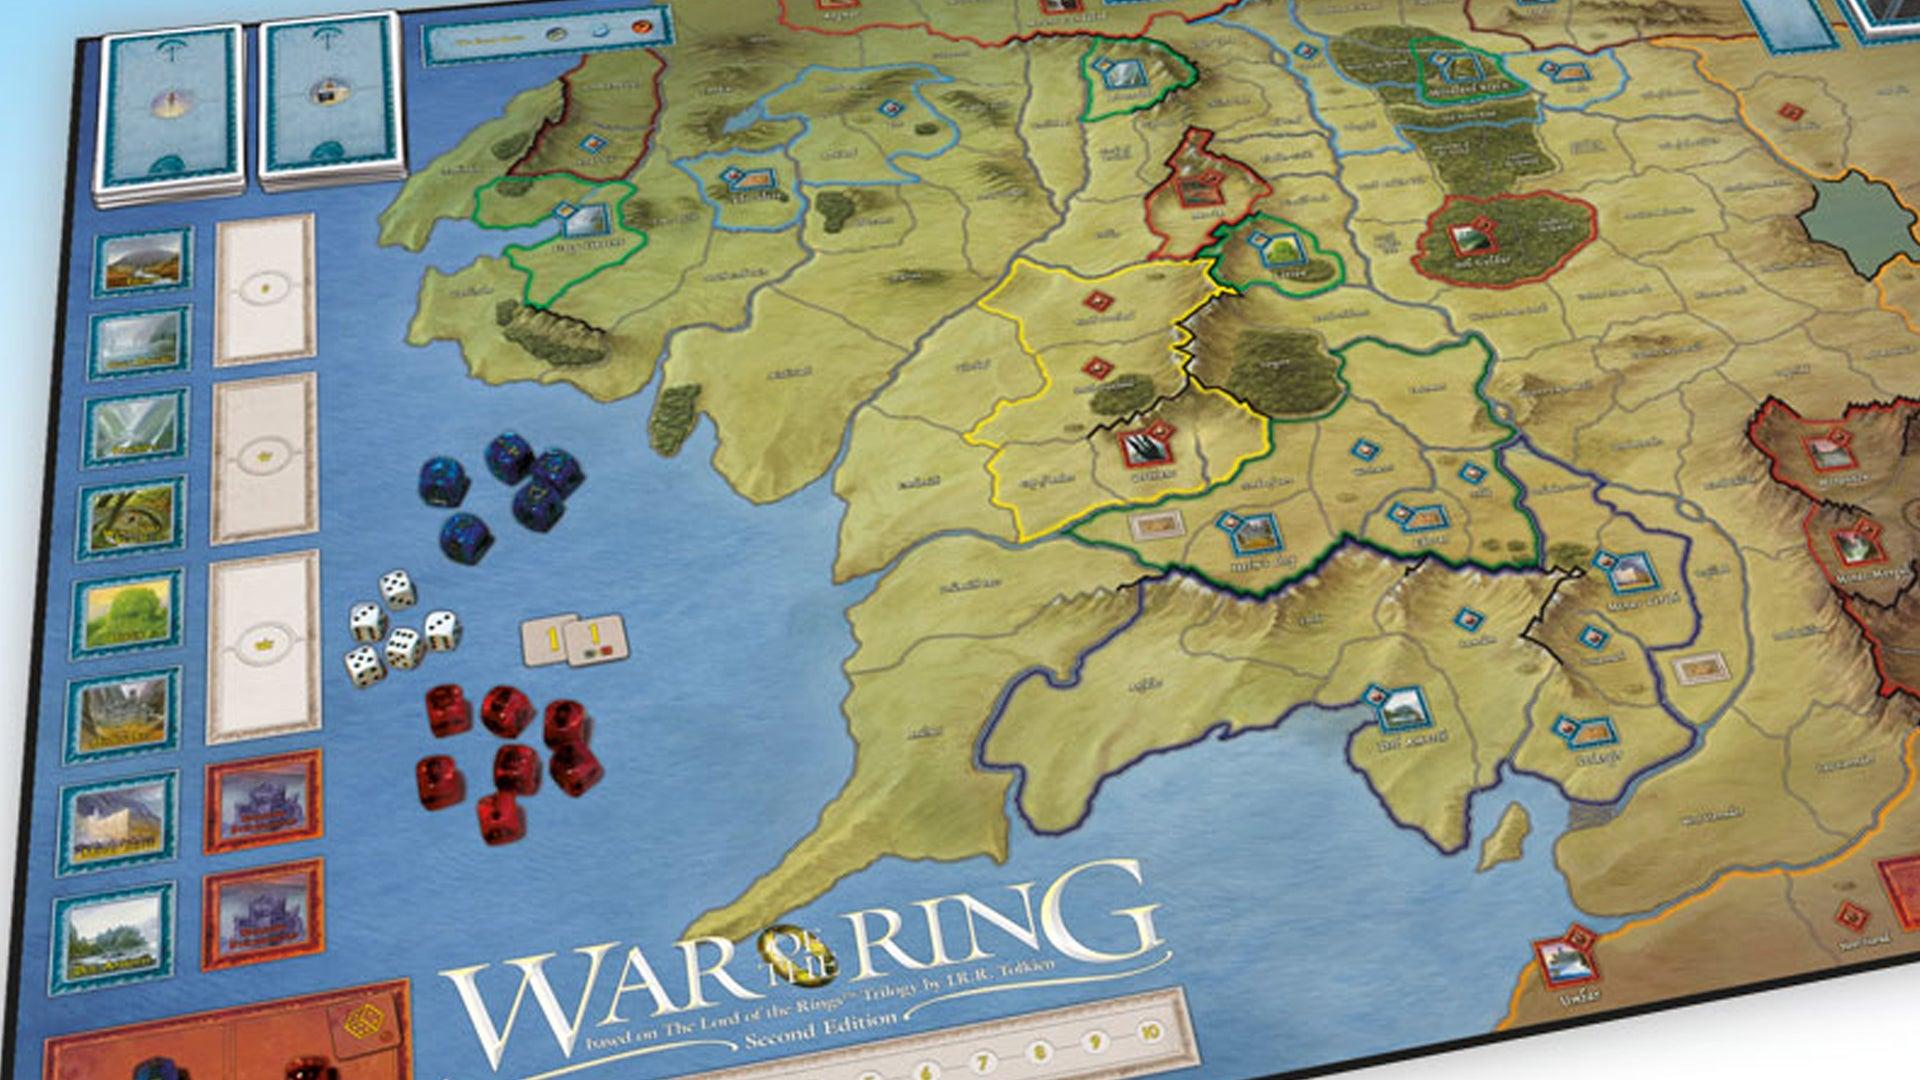 war-of-the-ring-board-game-board.jpg